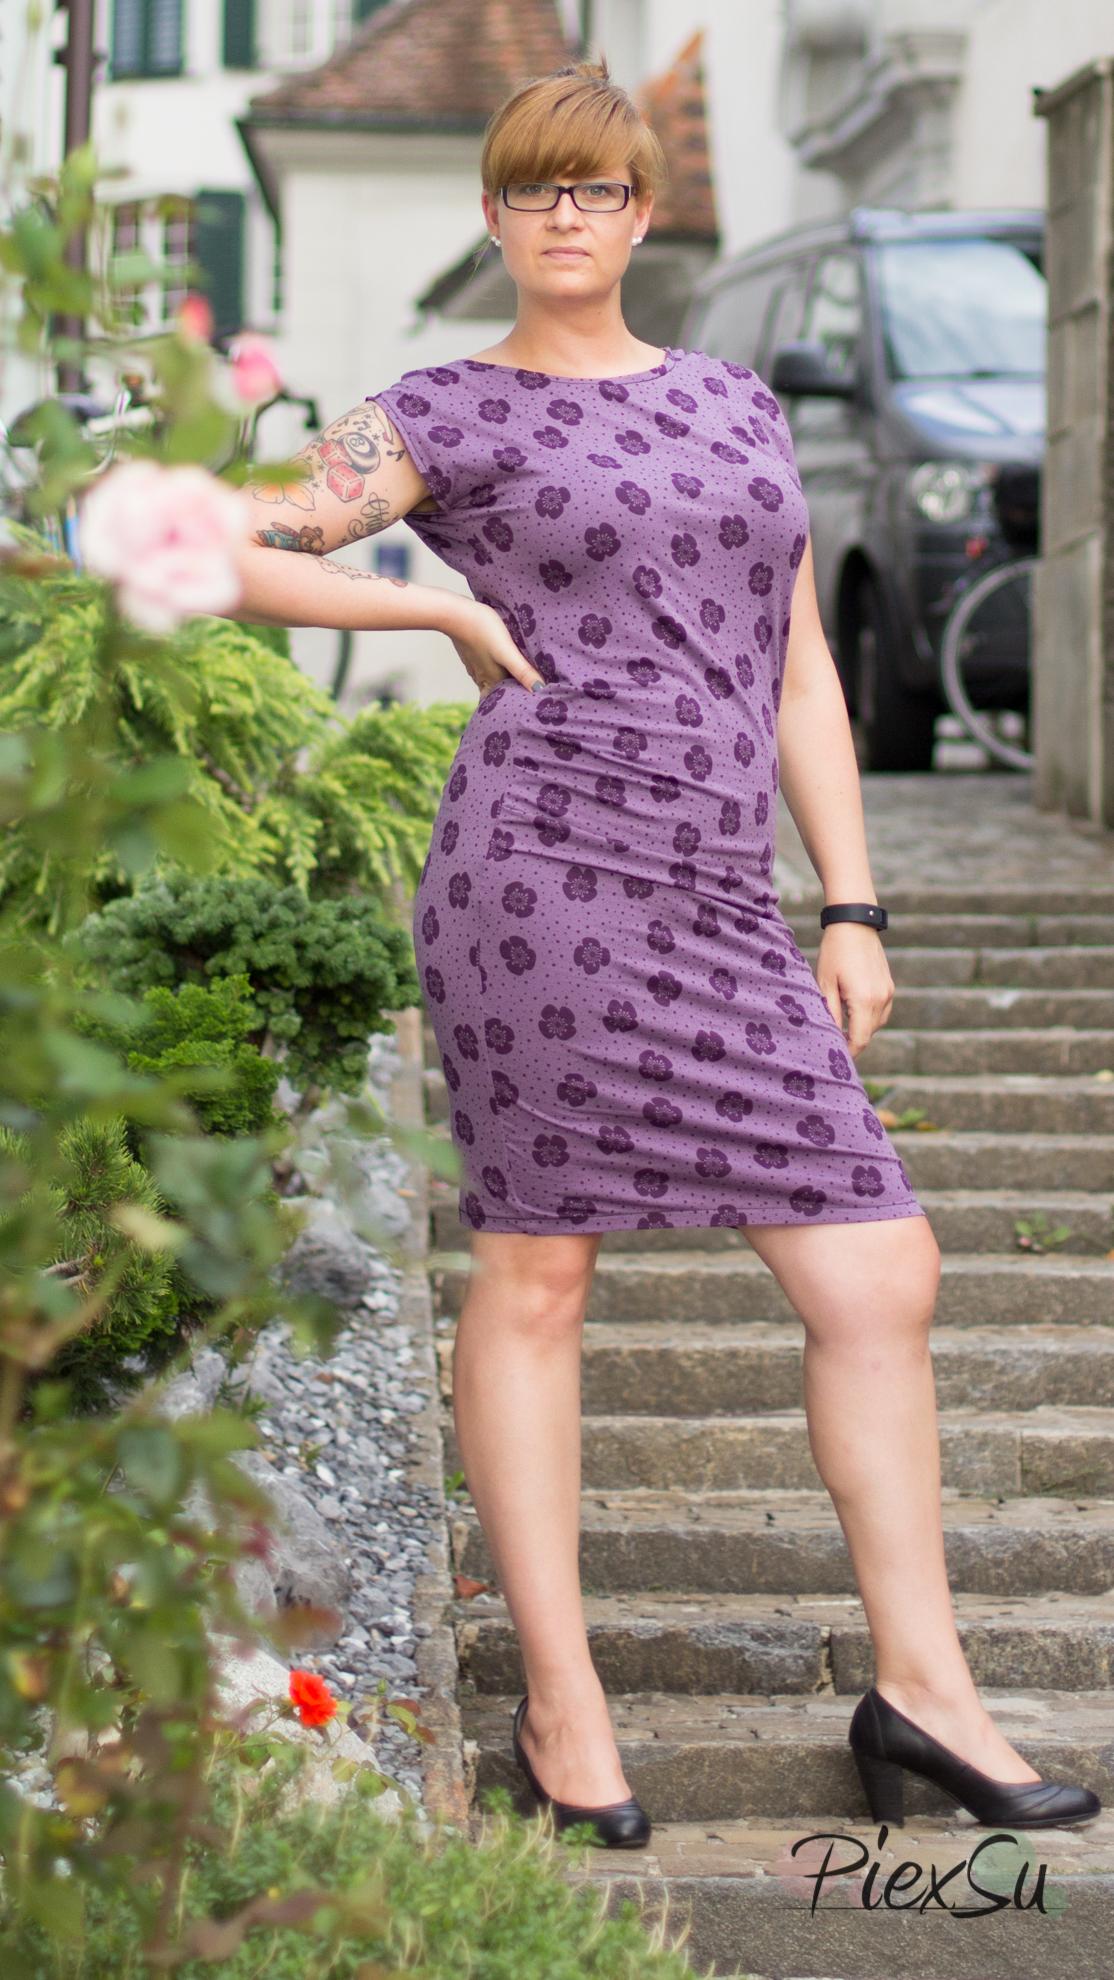 PiexSu Mesa Stad Kleid nähen Falten legen Schnittmuster Lillestoff (6)